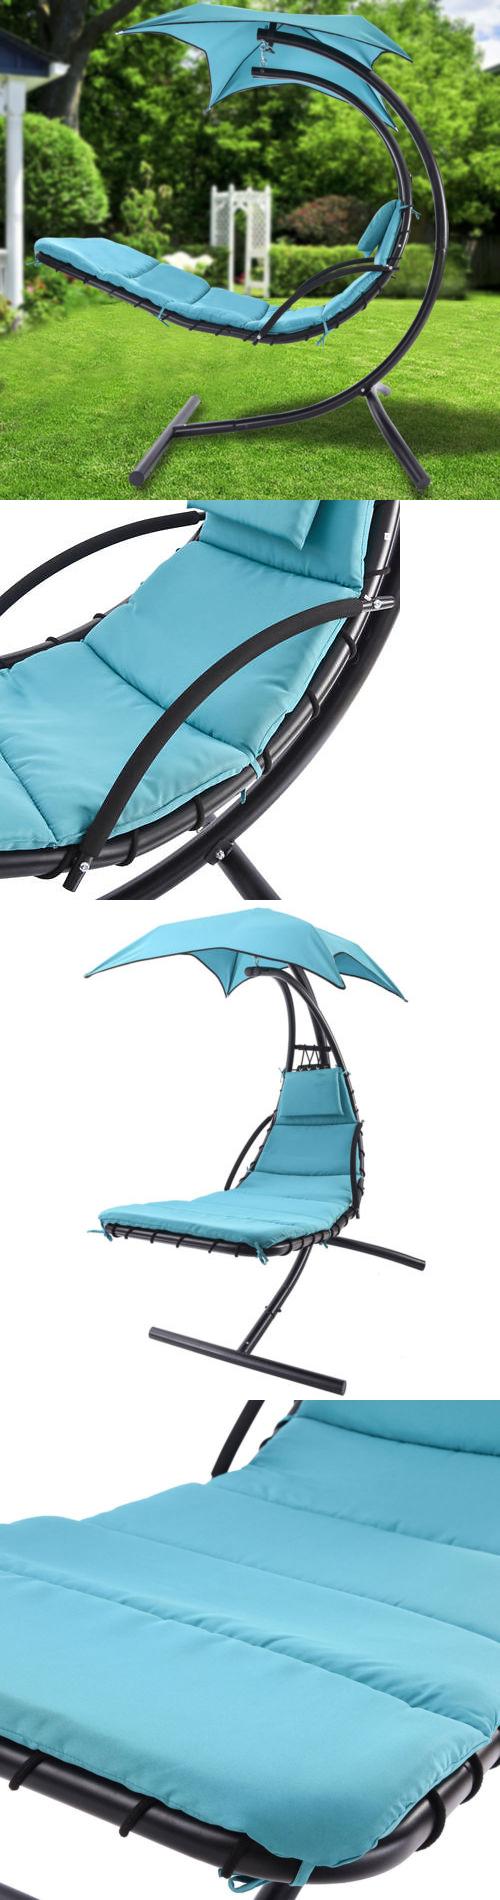 Hammocks hanging chaise lounger chair arc stand air porch